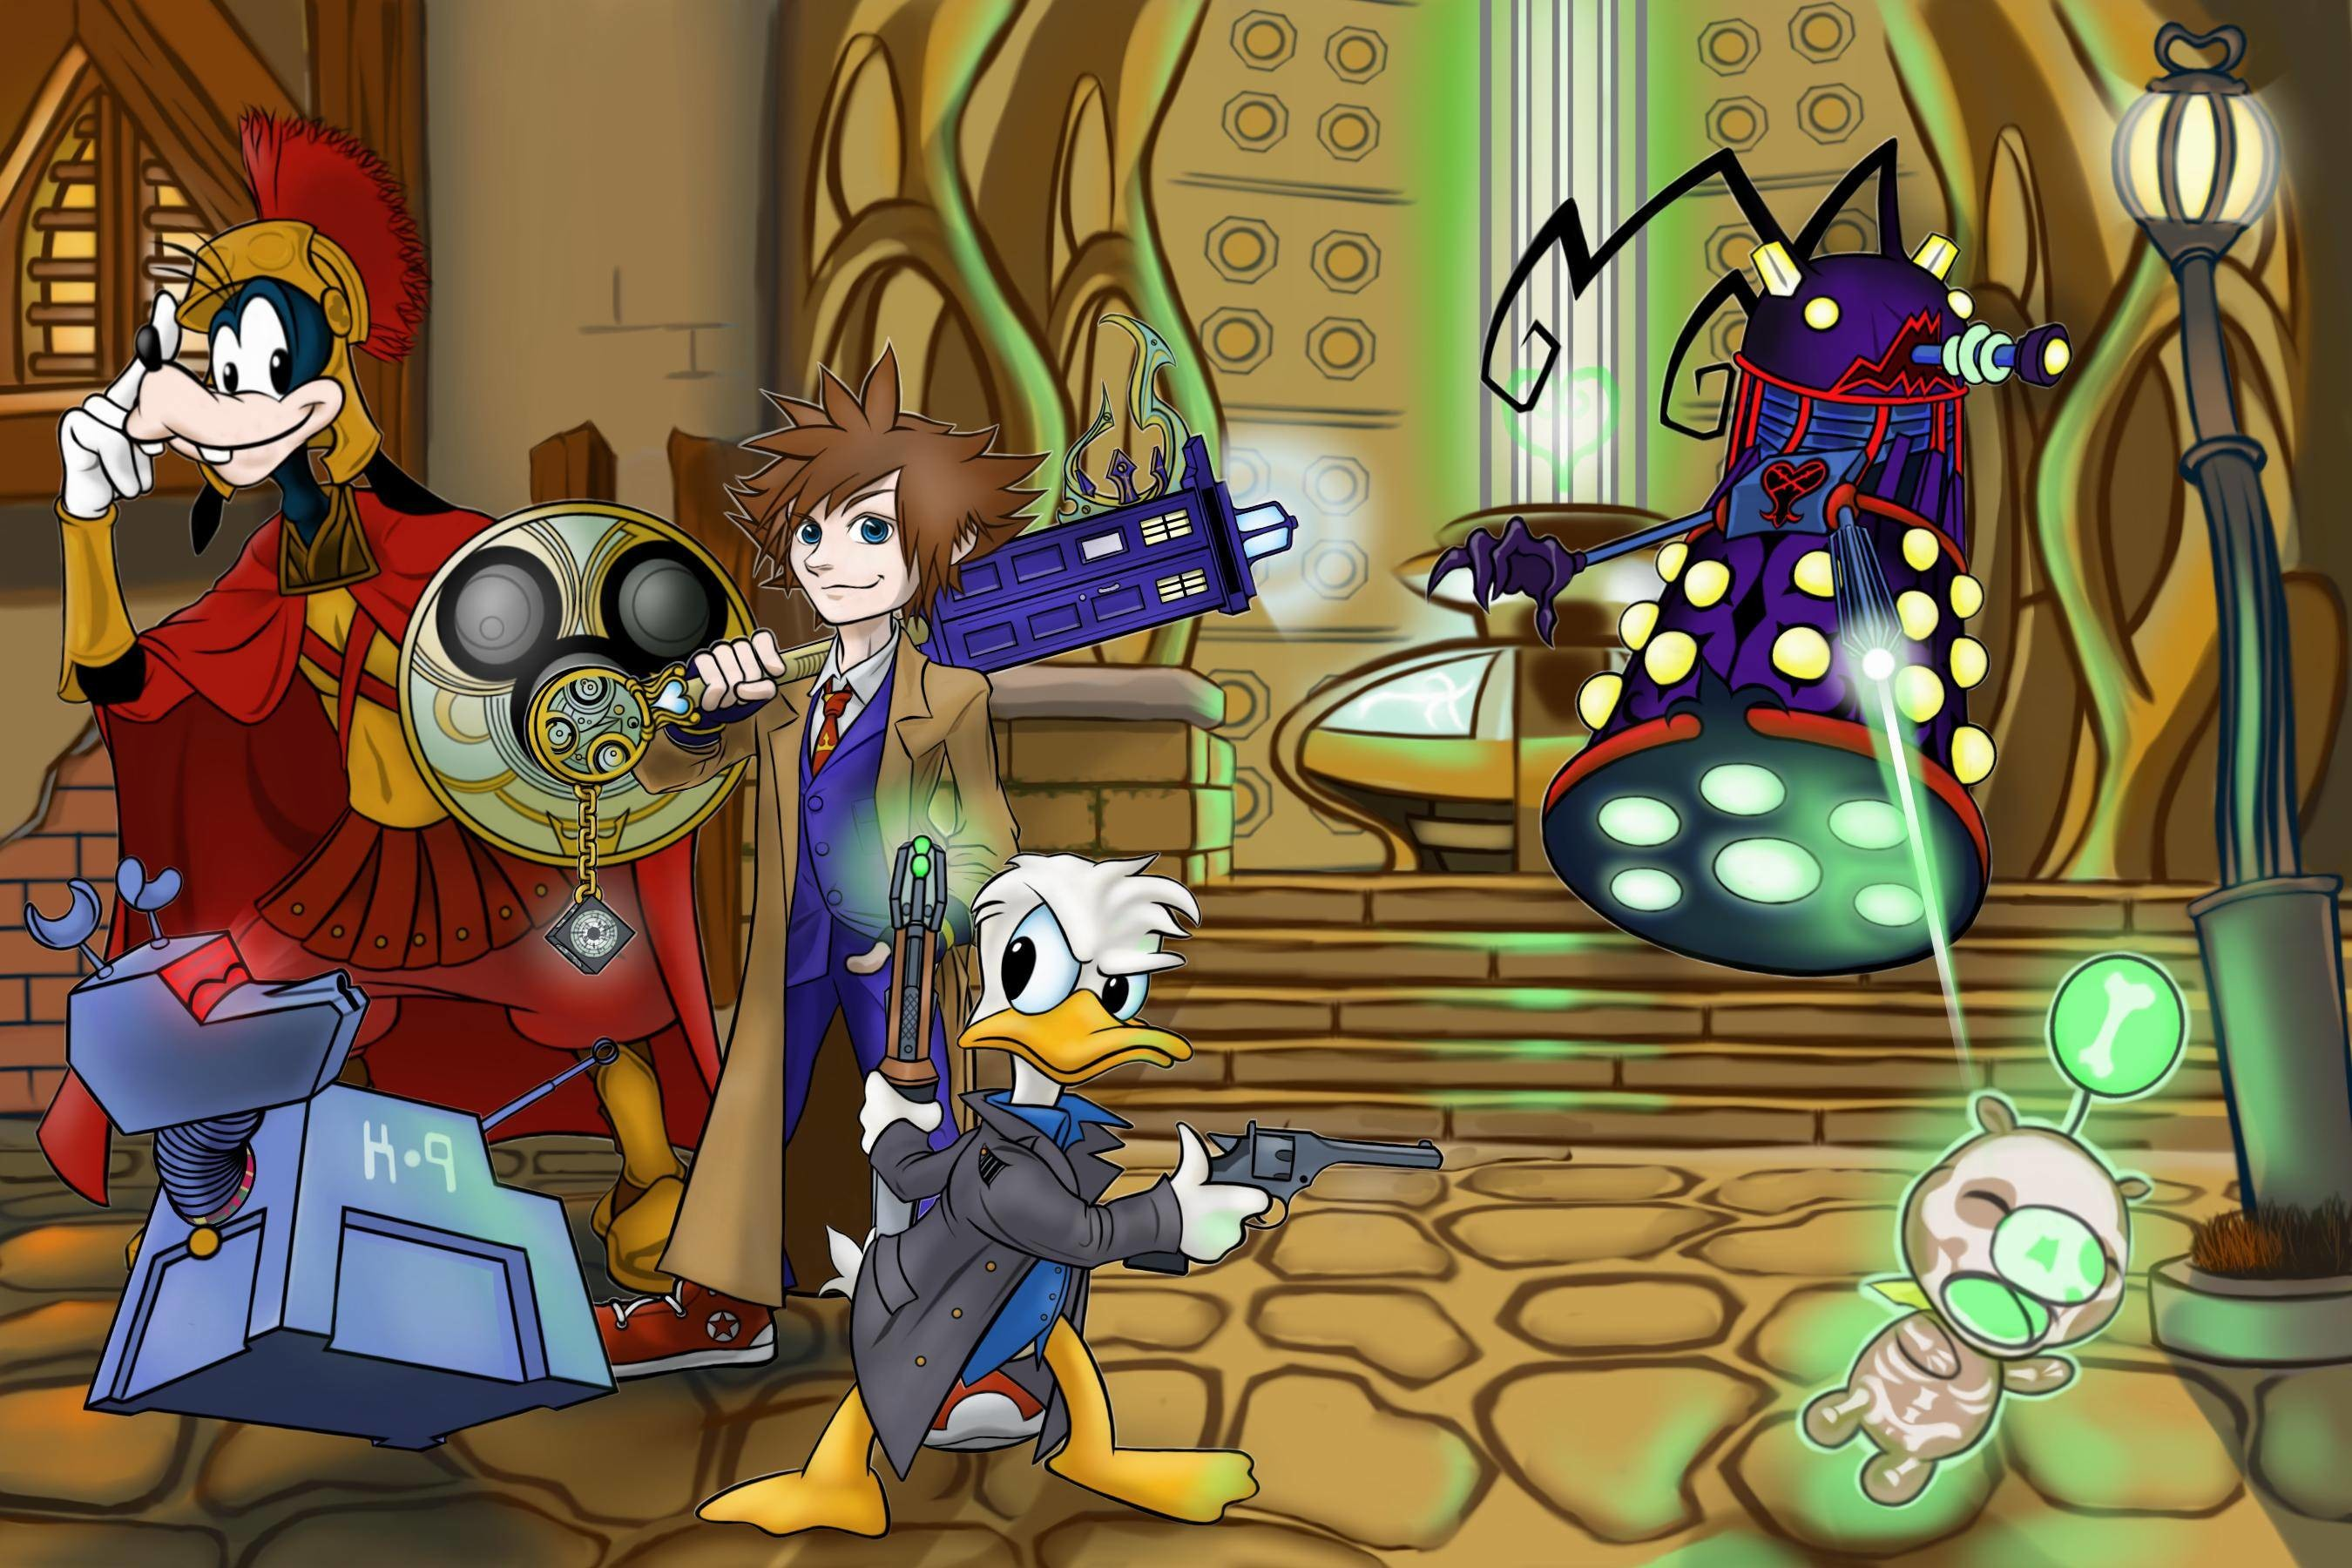 Doctor Who/Kingdom Hearts wallpaper …